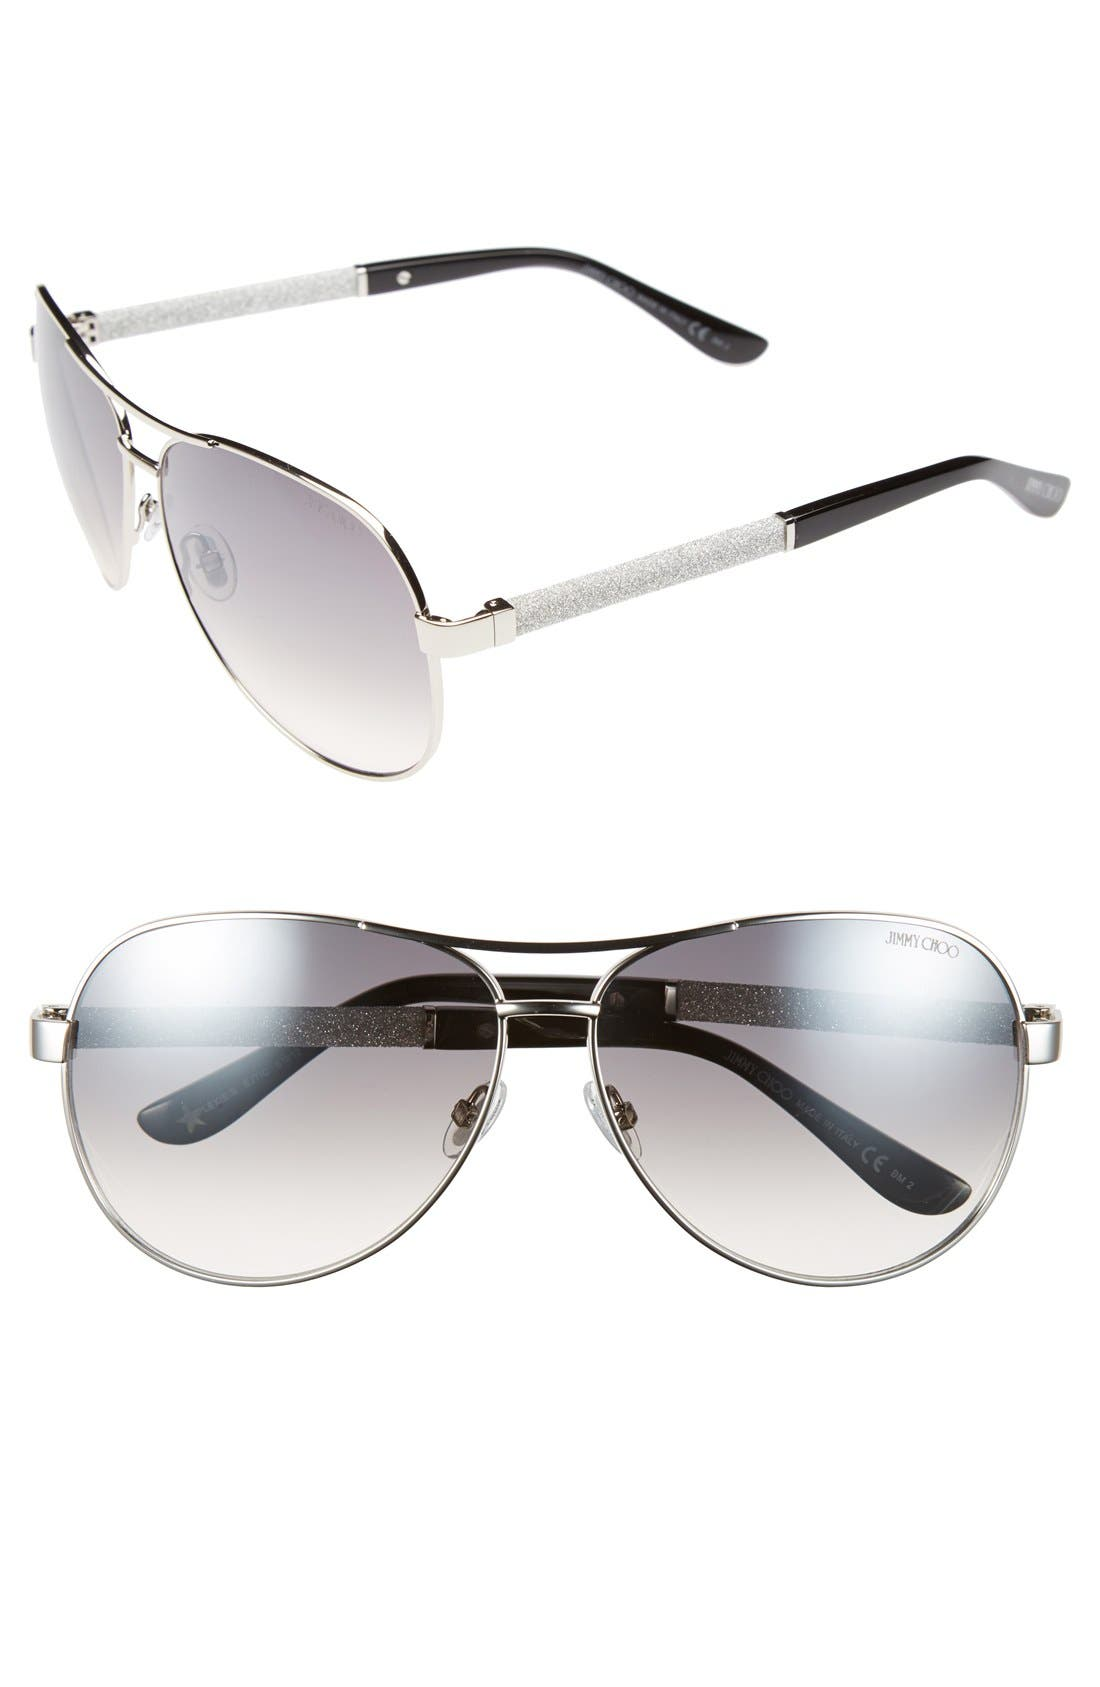 61mm Aviator Sunglasses,                             Main thumbnail 1, color,                             Palladium